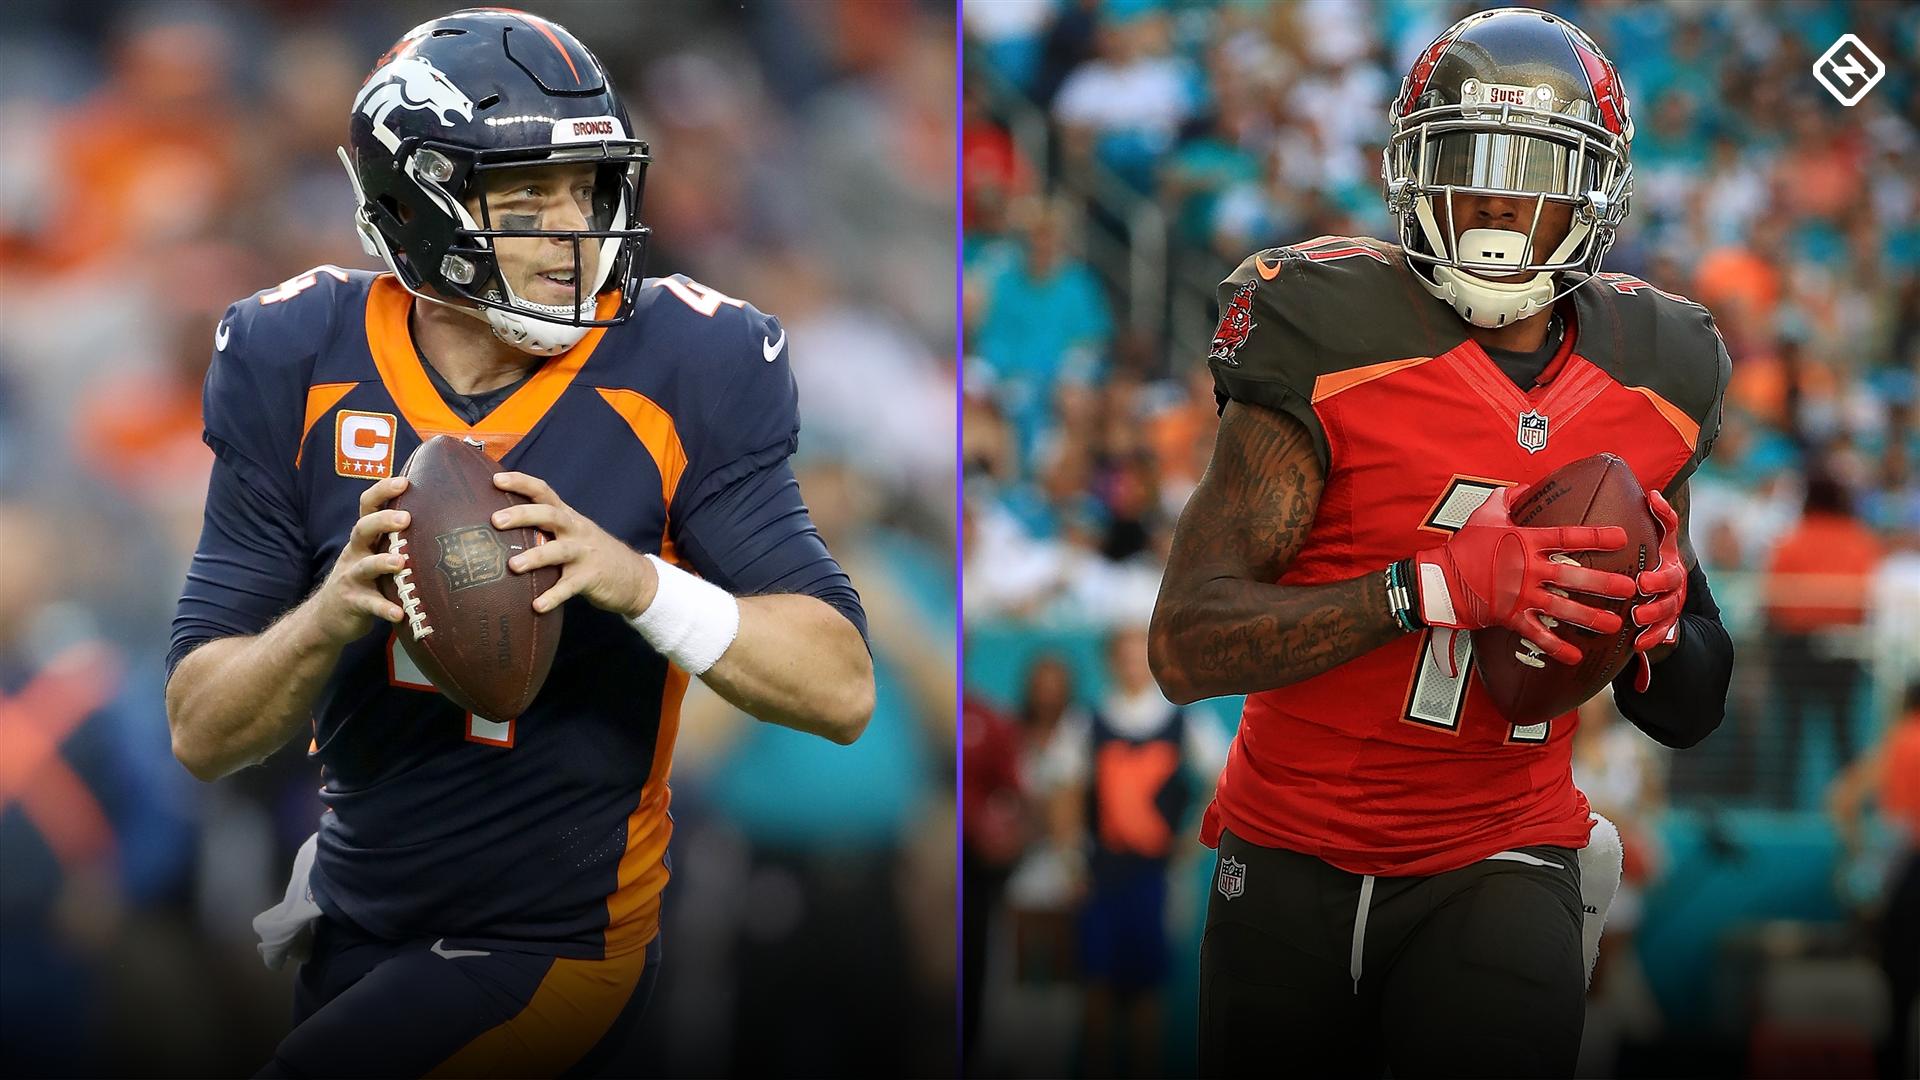 Projected Week 6 DraftKings ownership percentage, NFL DFS